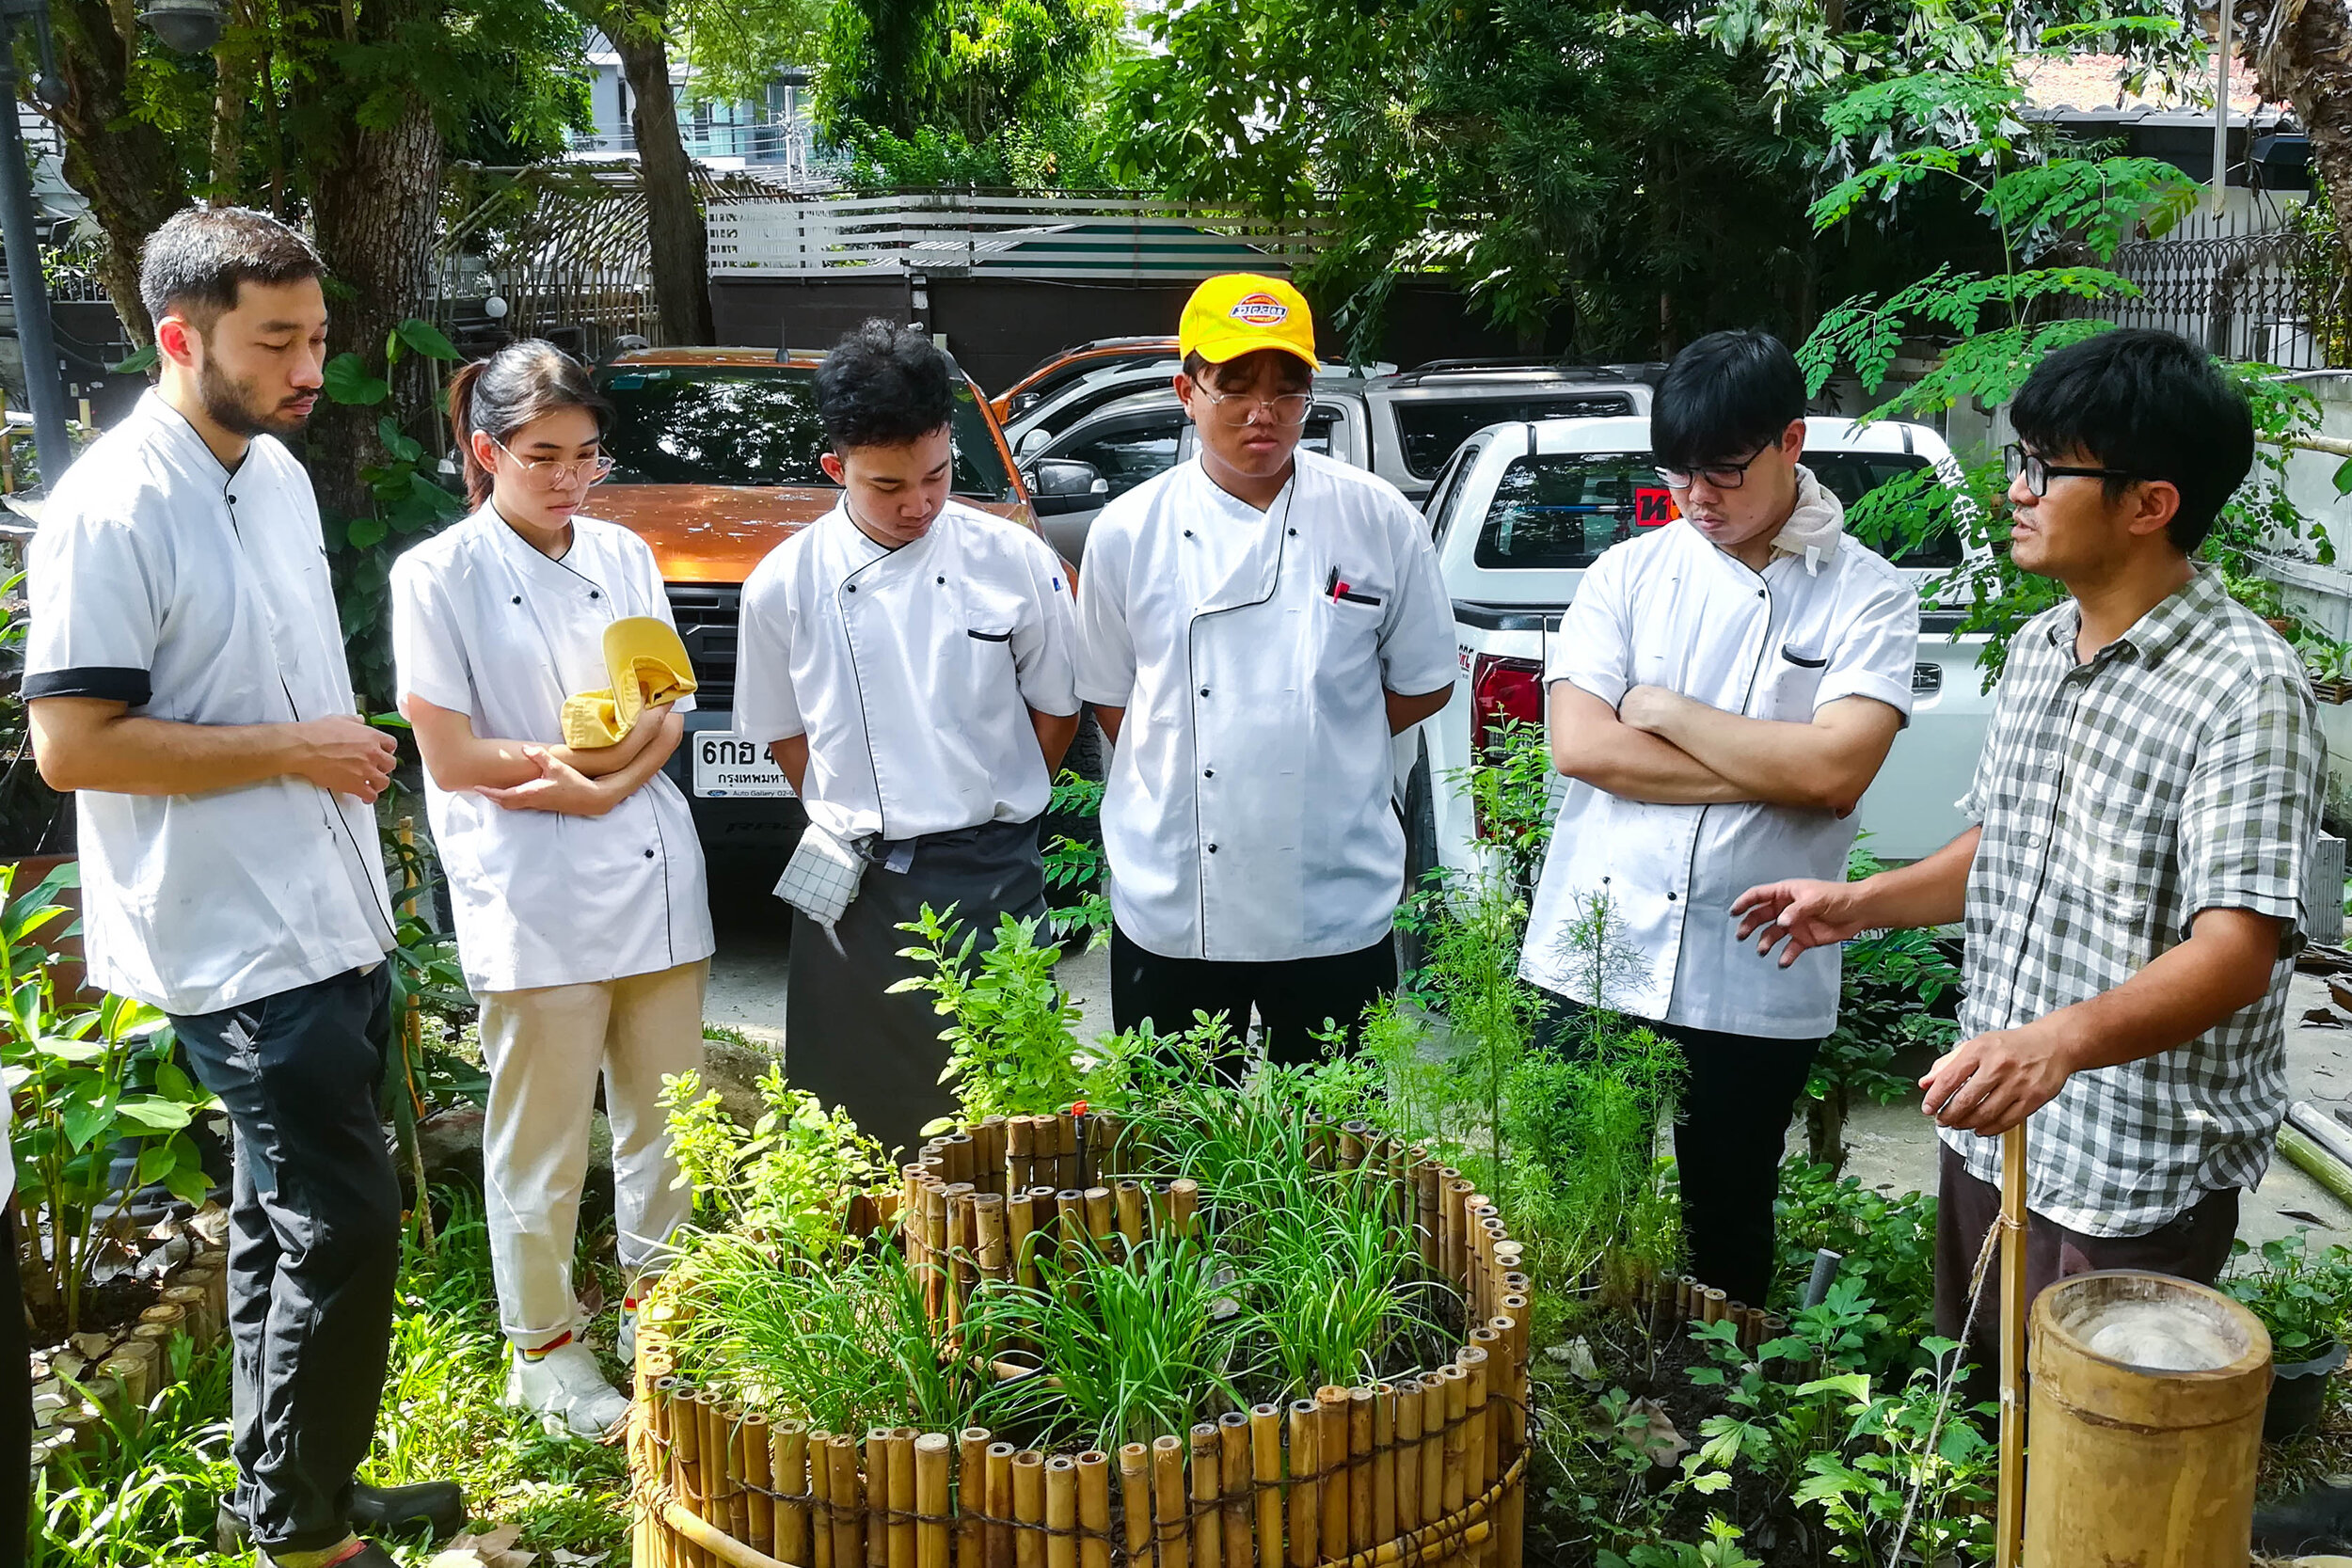 Bo.lan Edible Garden: Sustainable farming workshop run by Nakorn Limpacuptathavon (Prince) and Sunatthalinee Sinprom (Jig) in October 2019